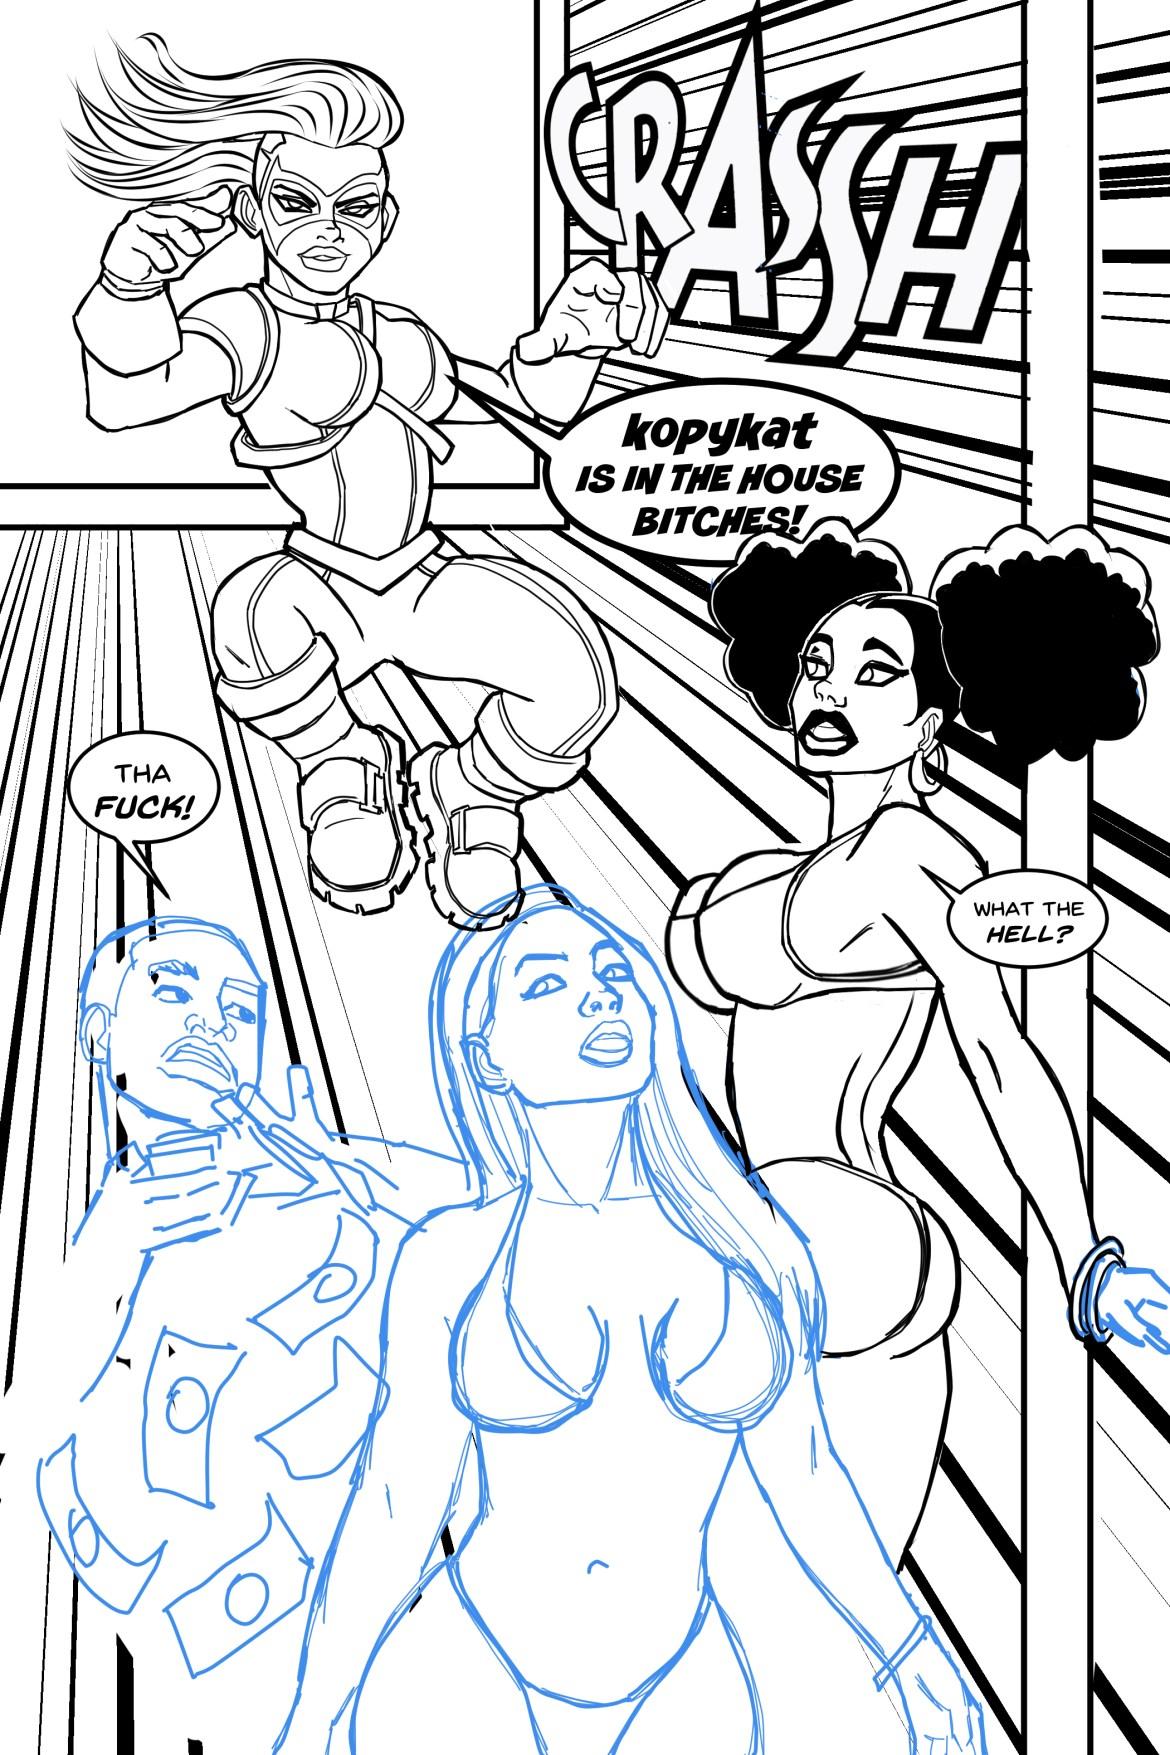 page 5 rework 01 aug 2016